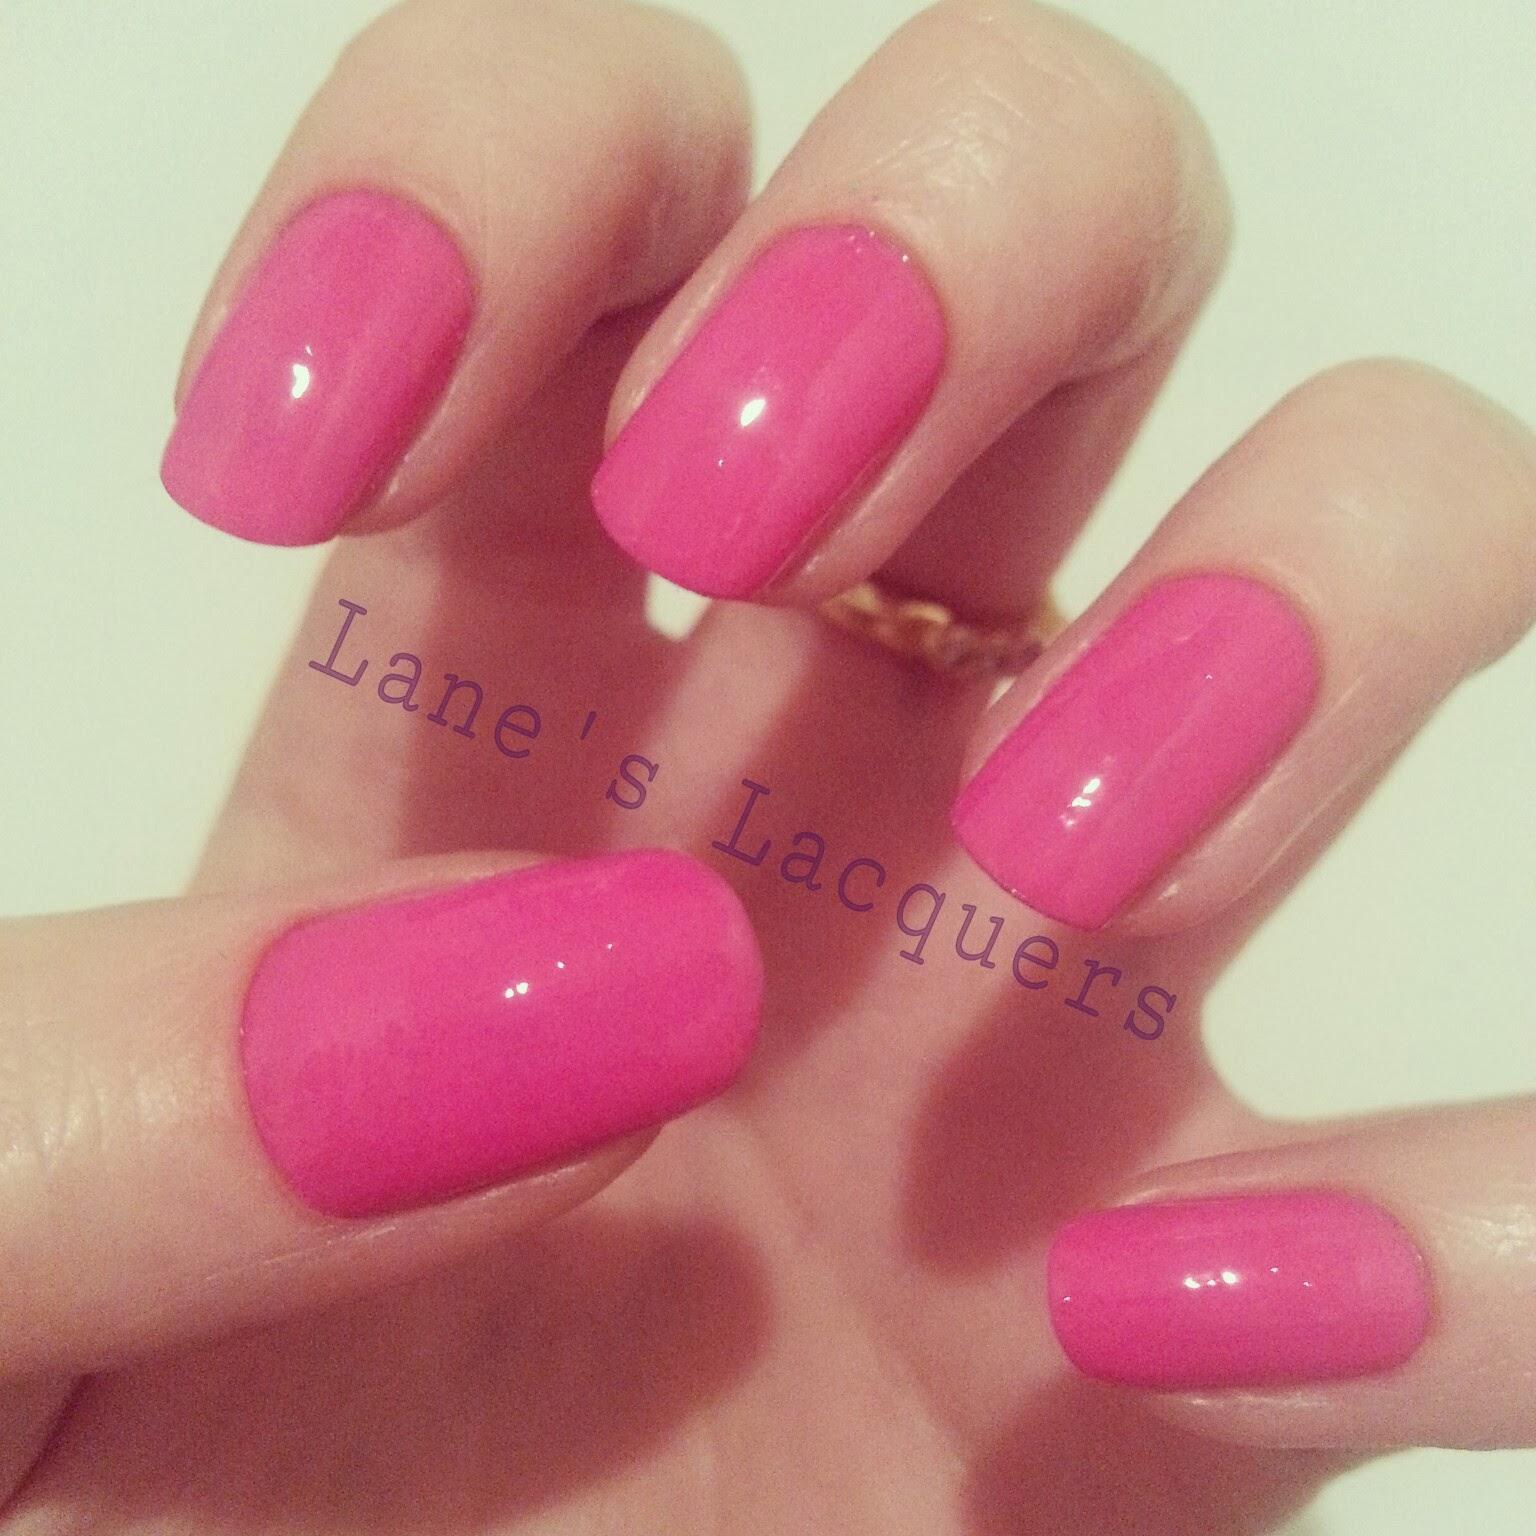 models-own-hypergels-cerise-shine-manicure